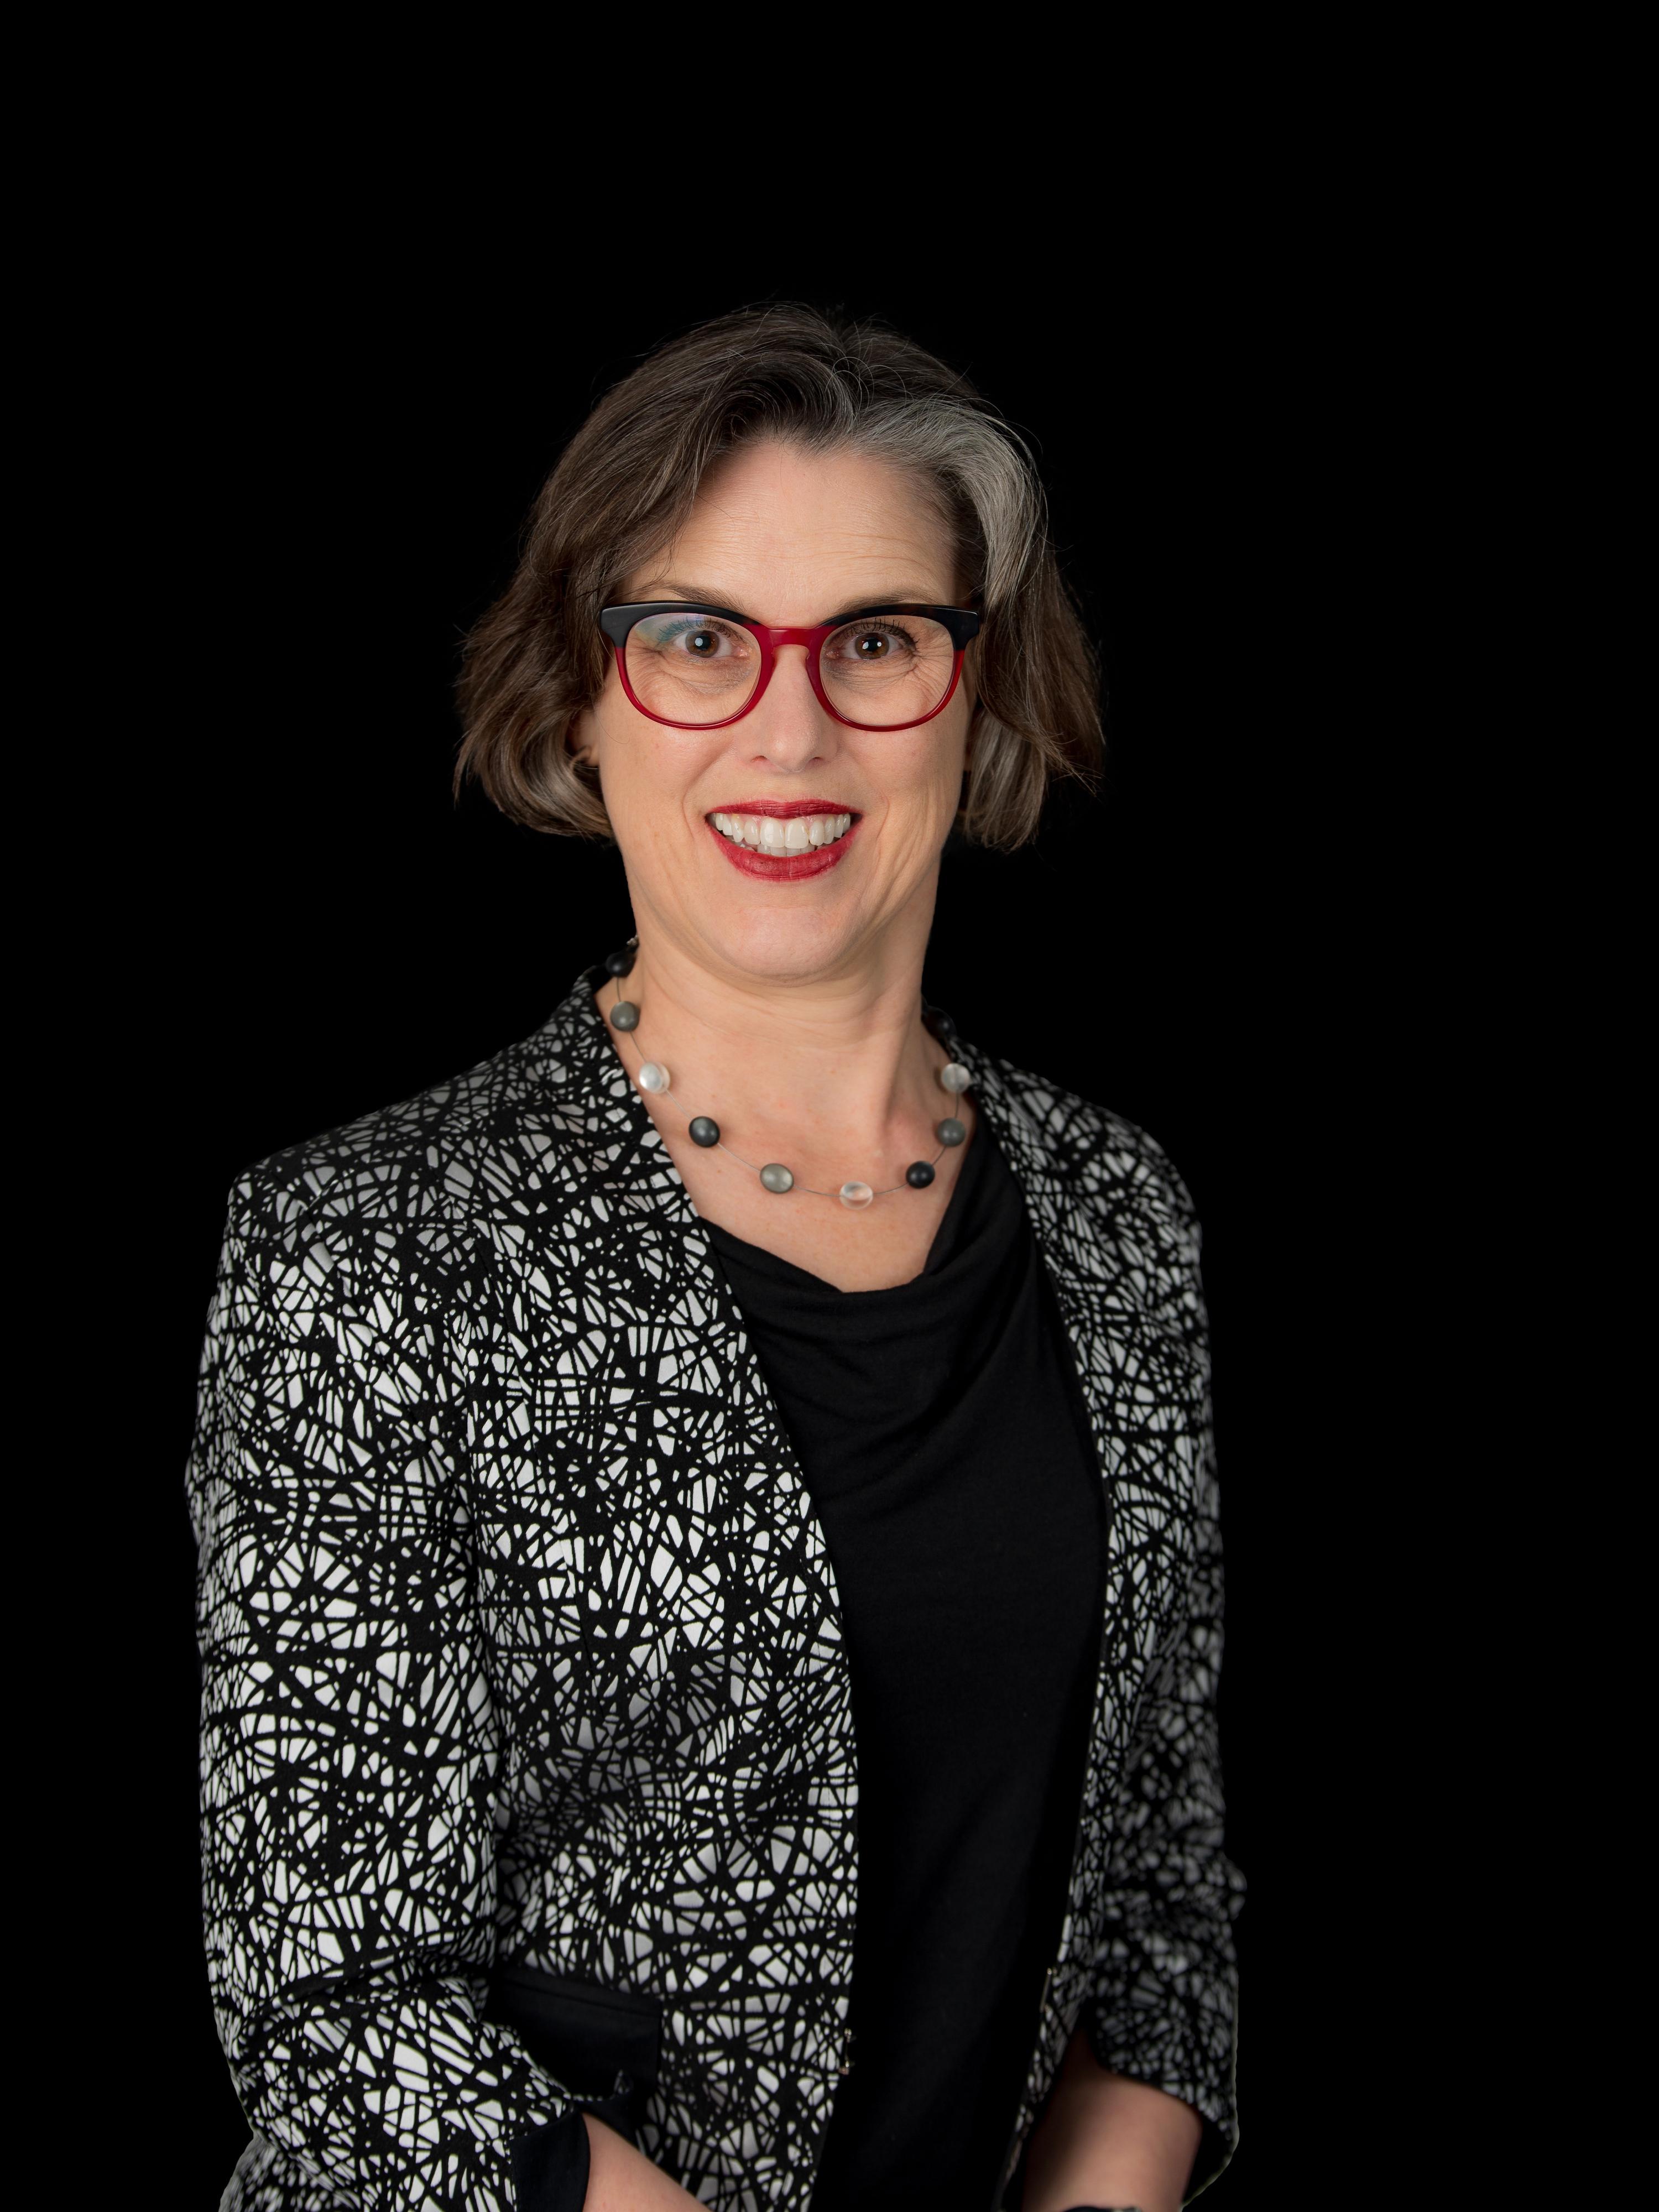 Eileen Thomas - Lighting Studio Lead Headshot